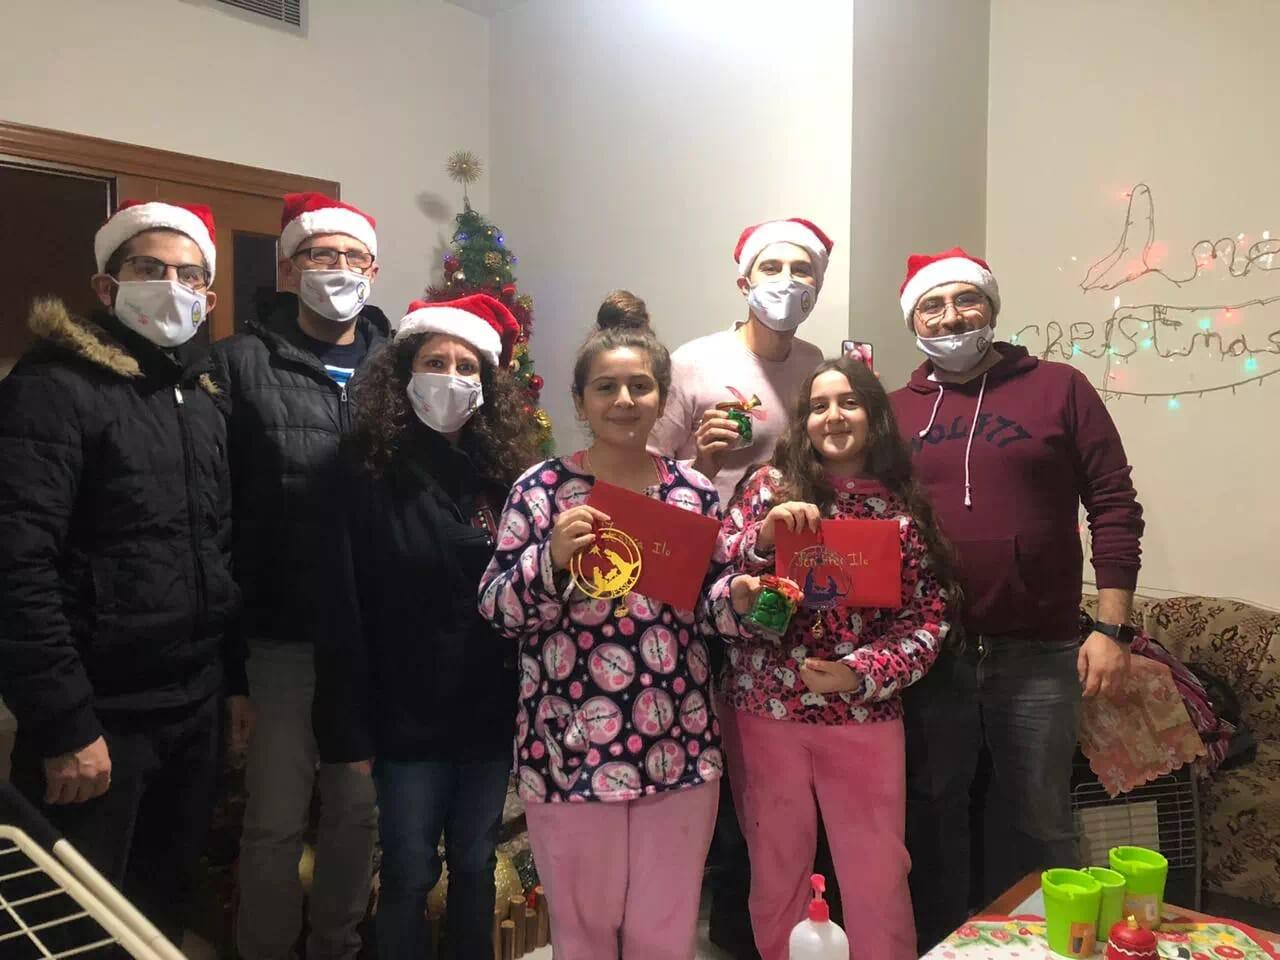 https://eundemia.sirv.com/Images/christmas/456920.webp